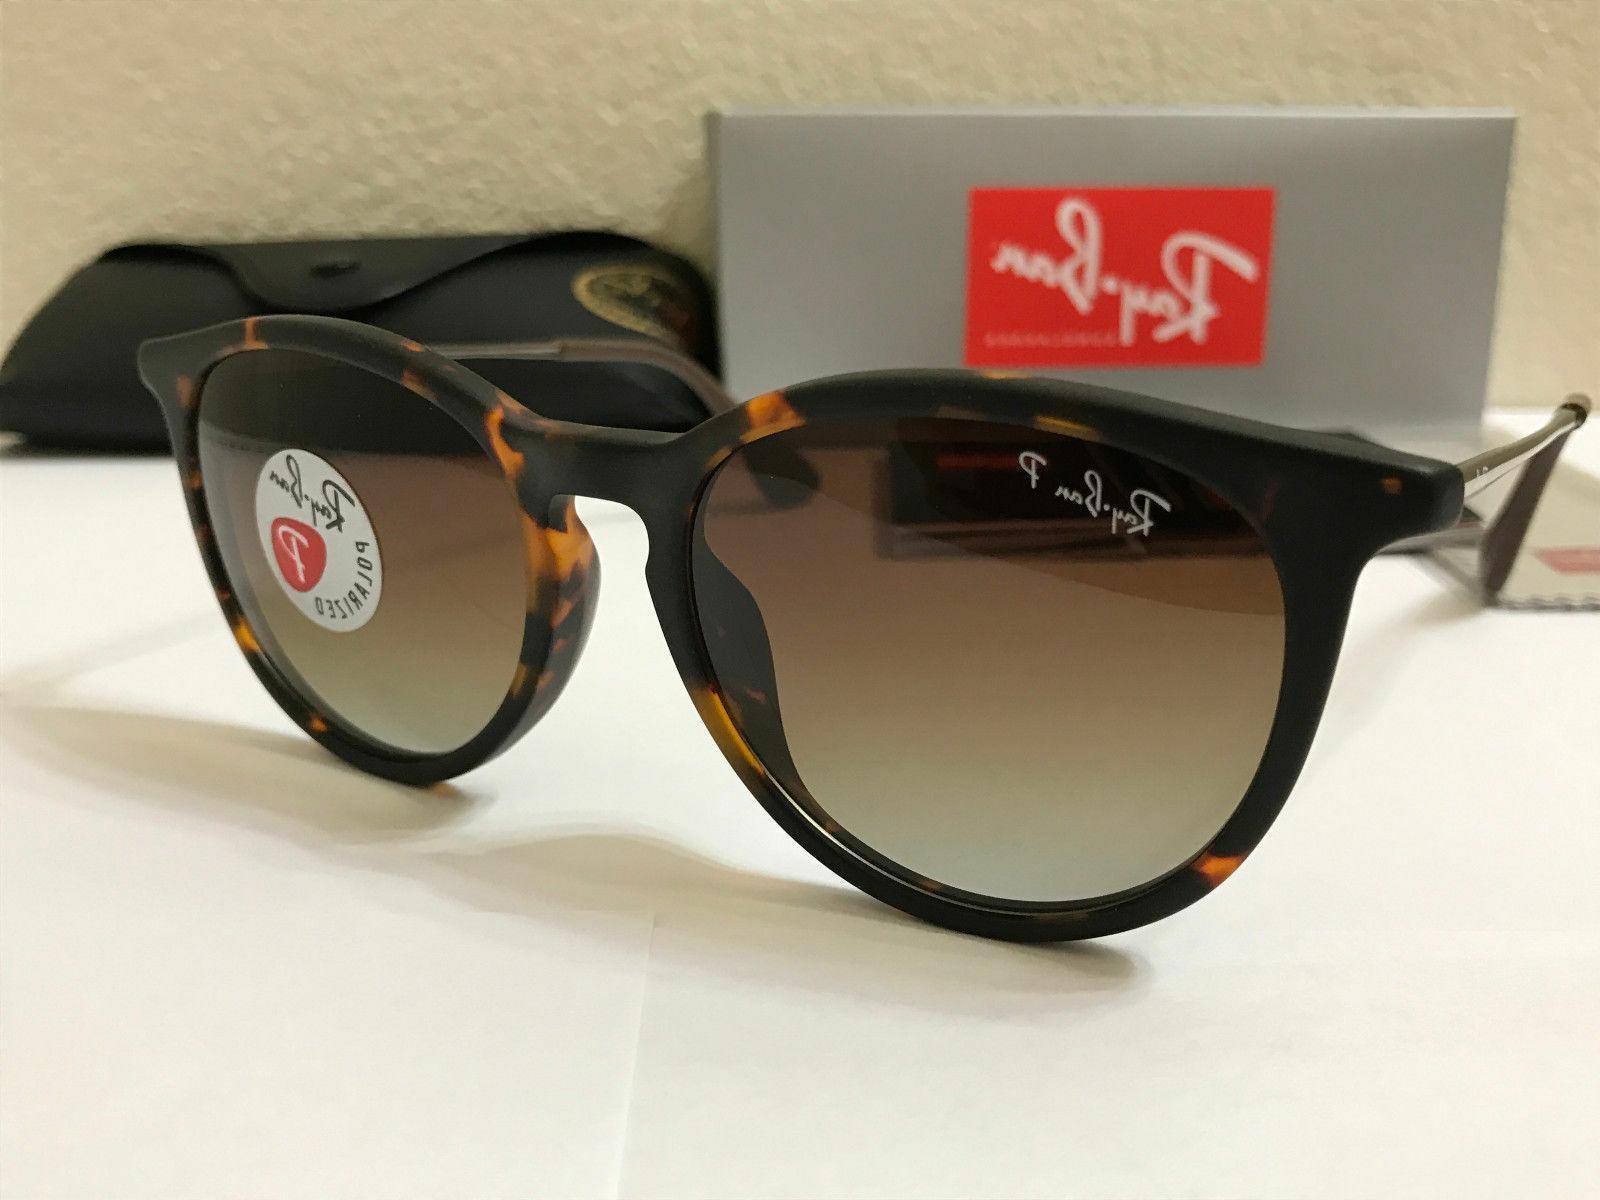 RAY-BAN Sunglasses Erika Polarized Matte Tortoise Frame W/Br